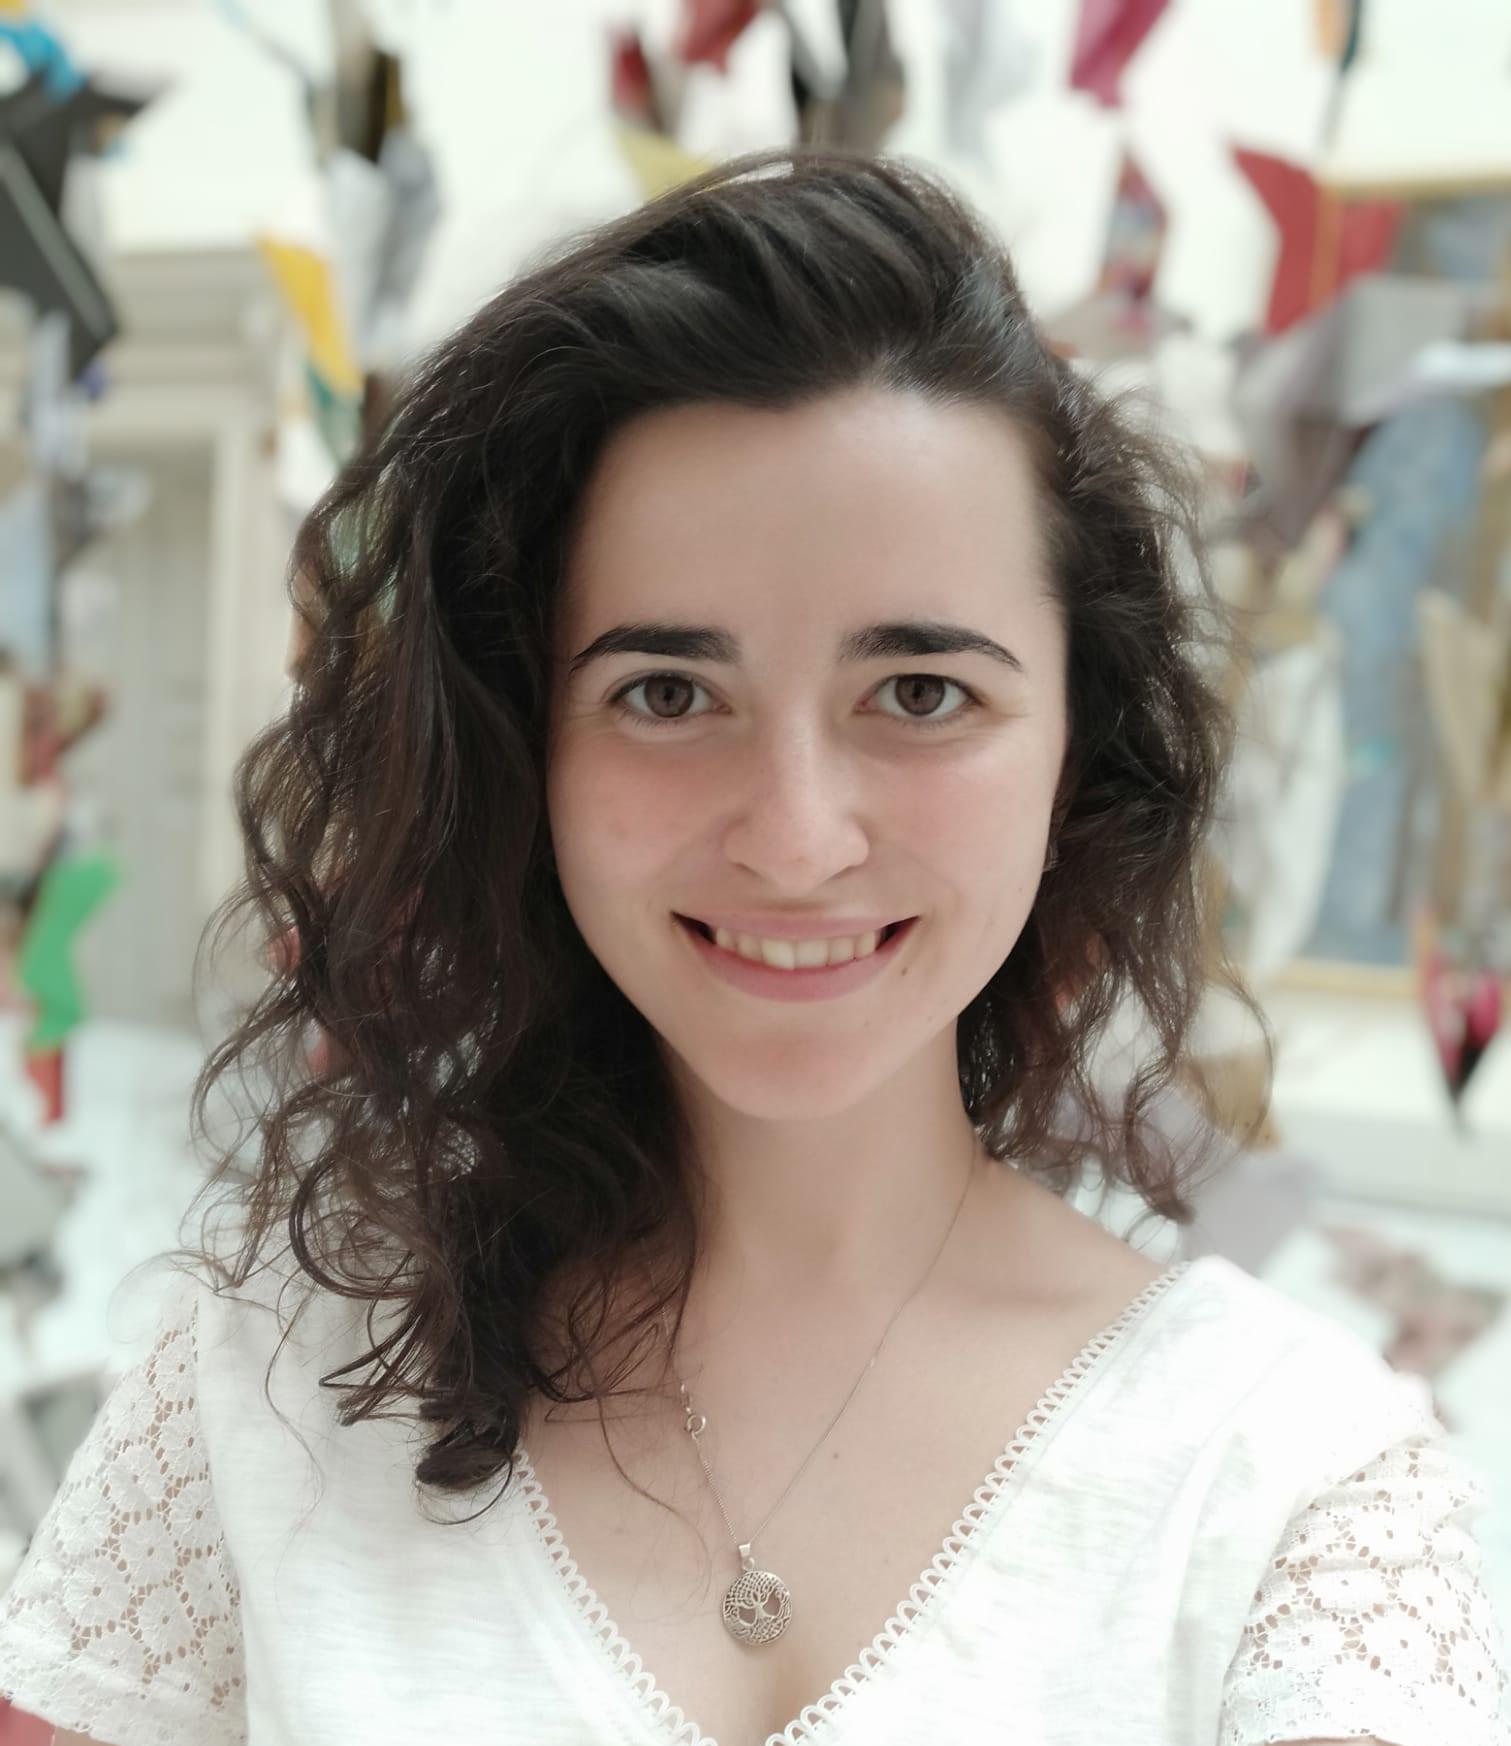 Natalia Obikhod - Course Assistant